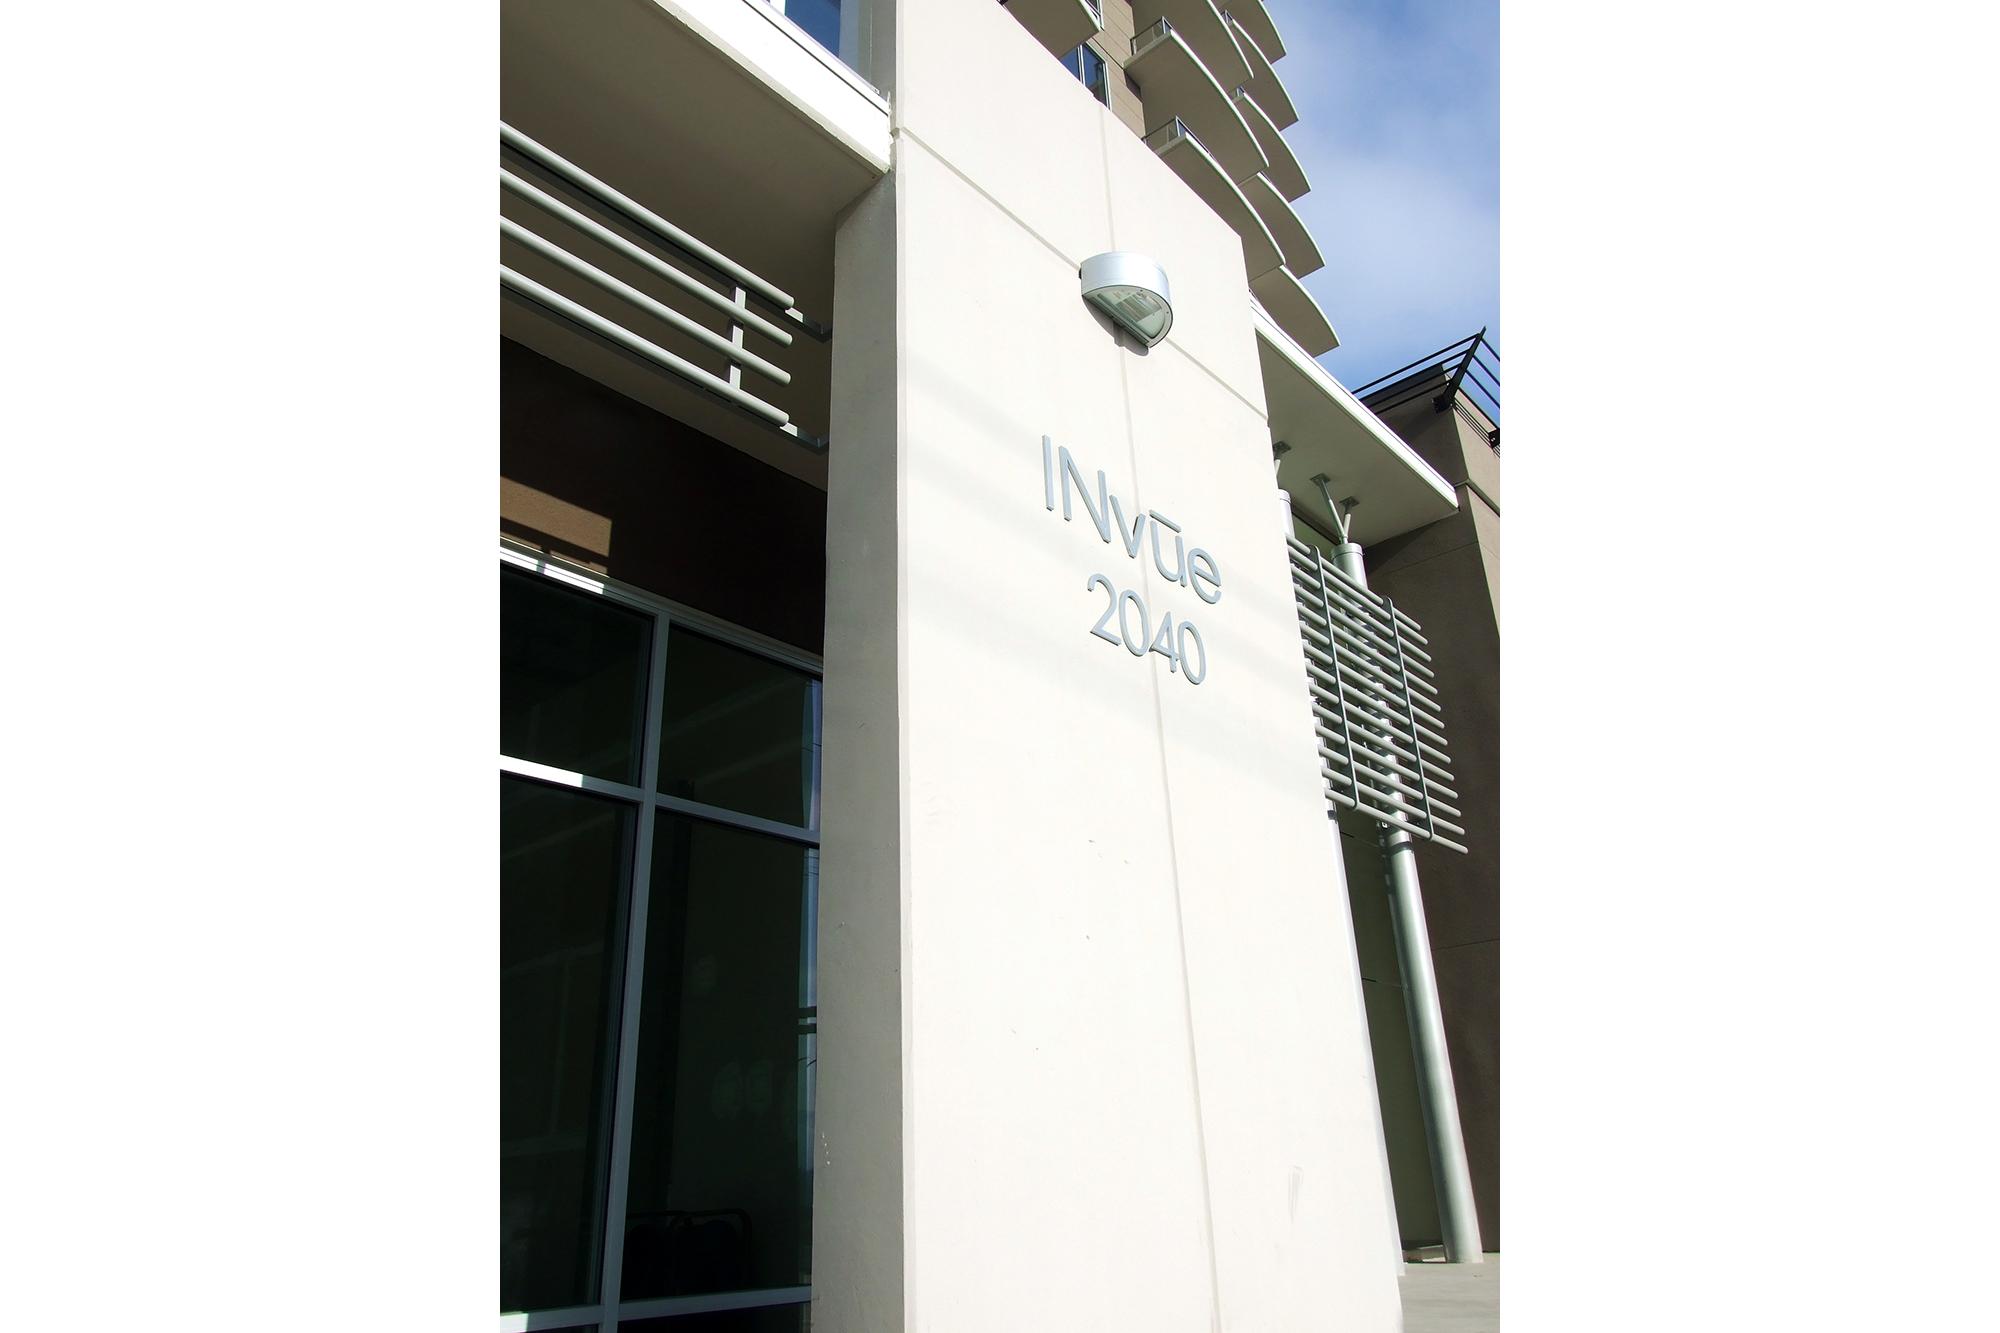 Invue_exterior_0006b.jpg